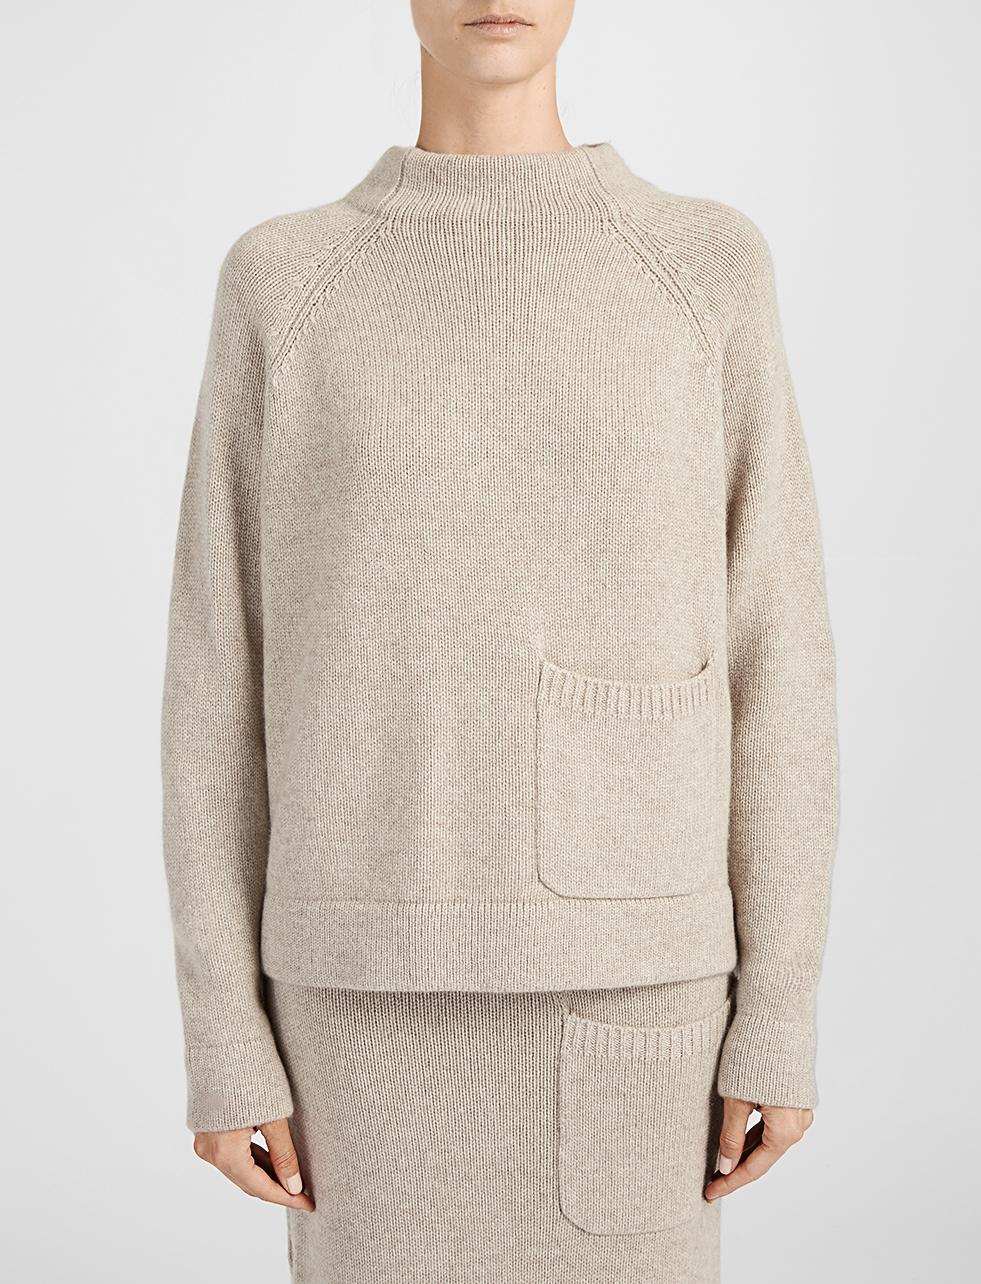 Great Deals For Sale Footlocker Pictures Online Joseph high neck sweater Order Jrw35c6